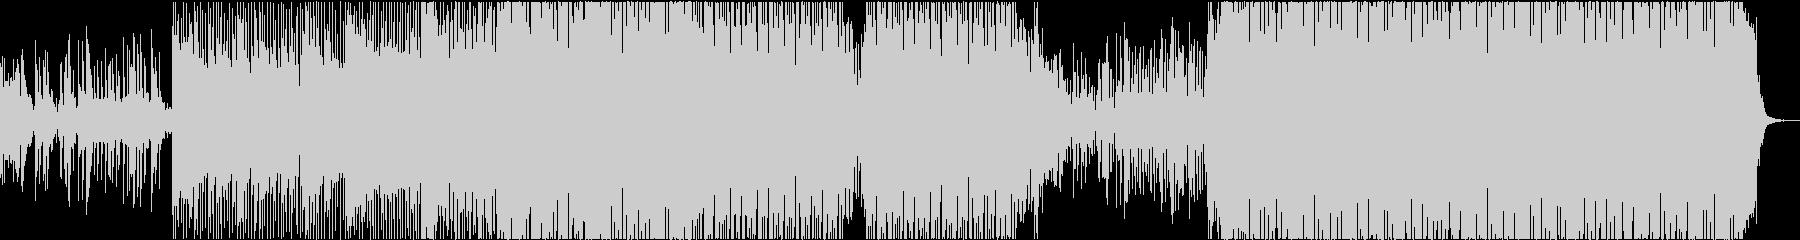 EDM リアル 明るい ピアノ 始まりの未再生の波形